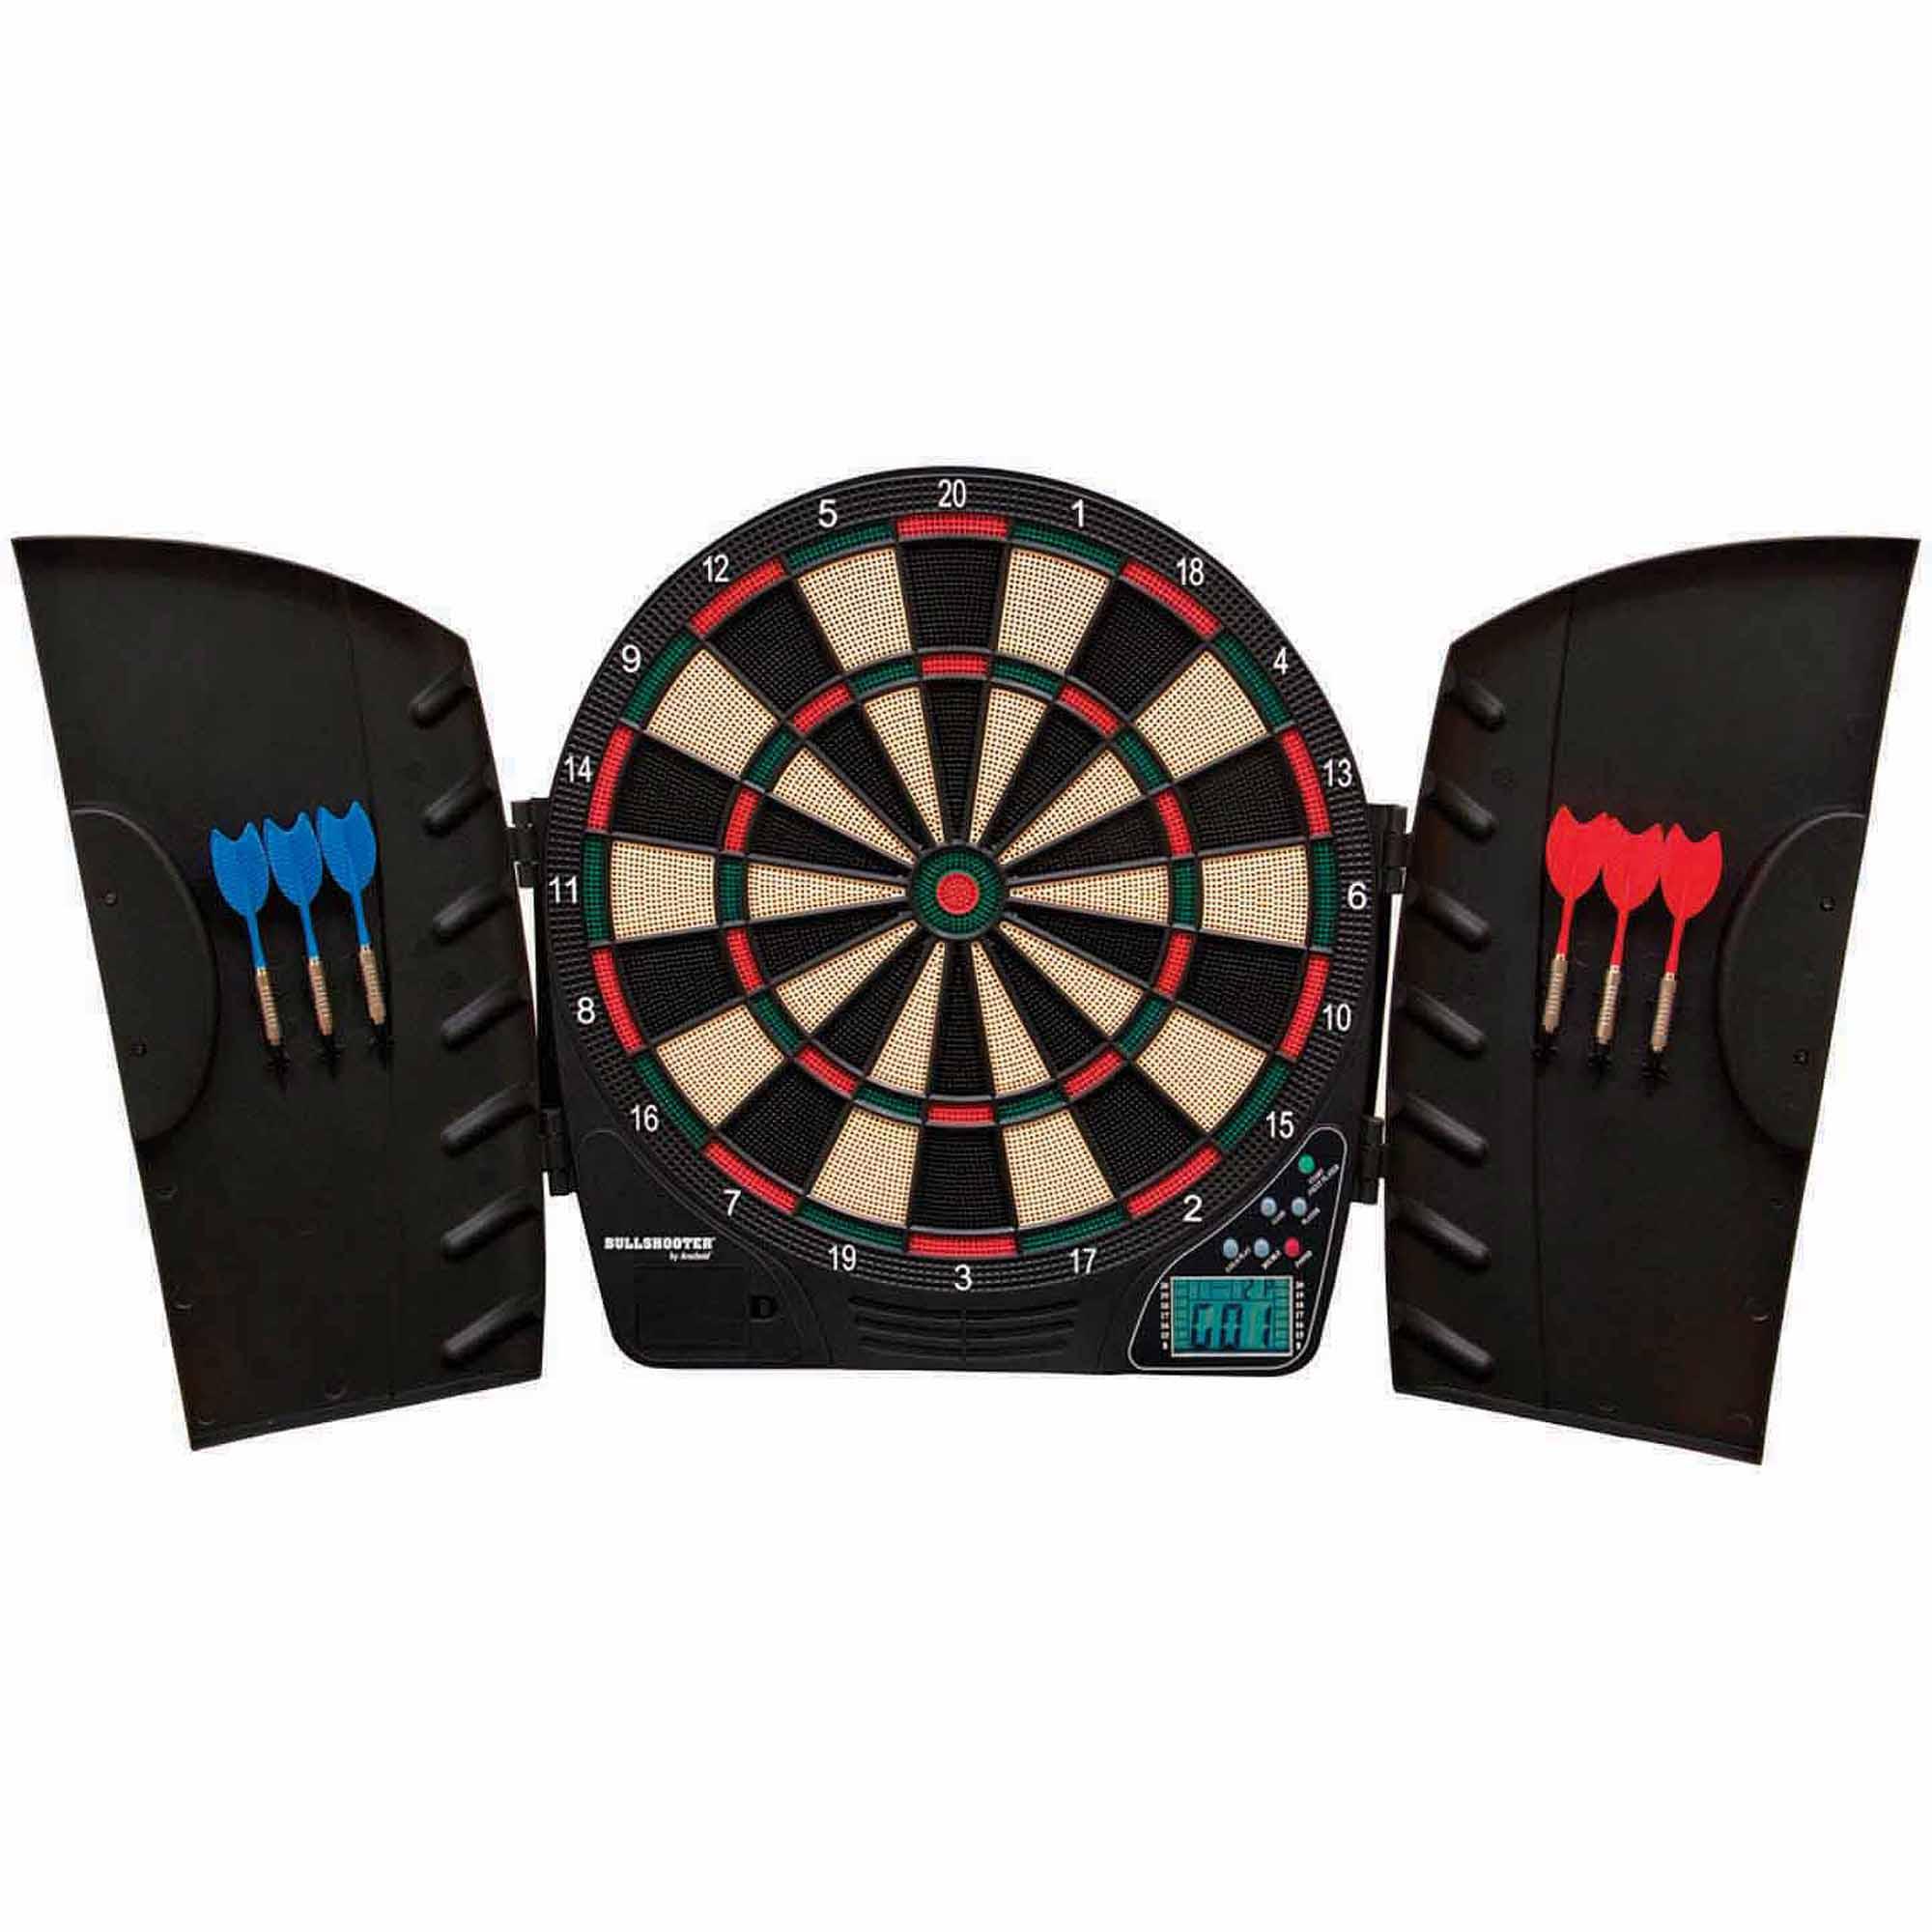 Viper 787 Electronic Dartboard - Walmart.com